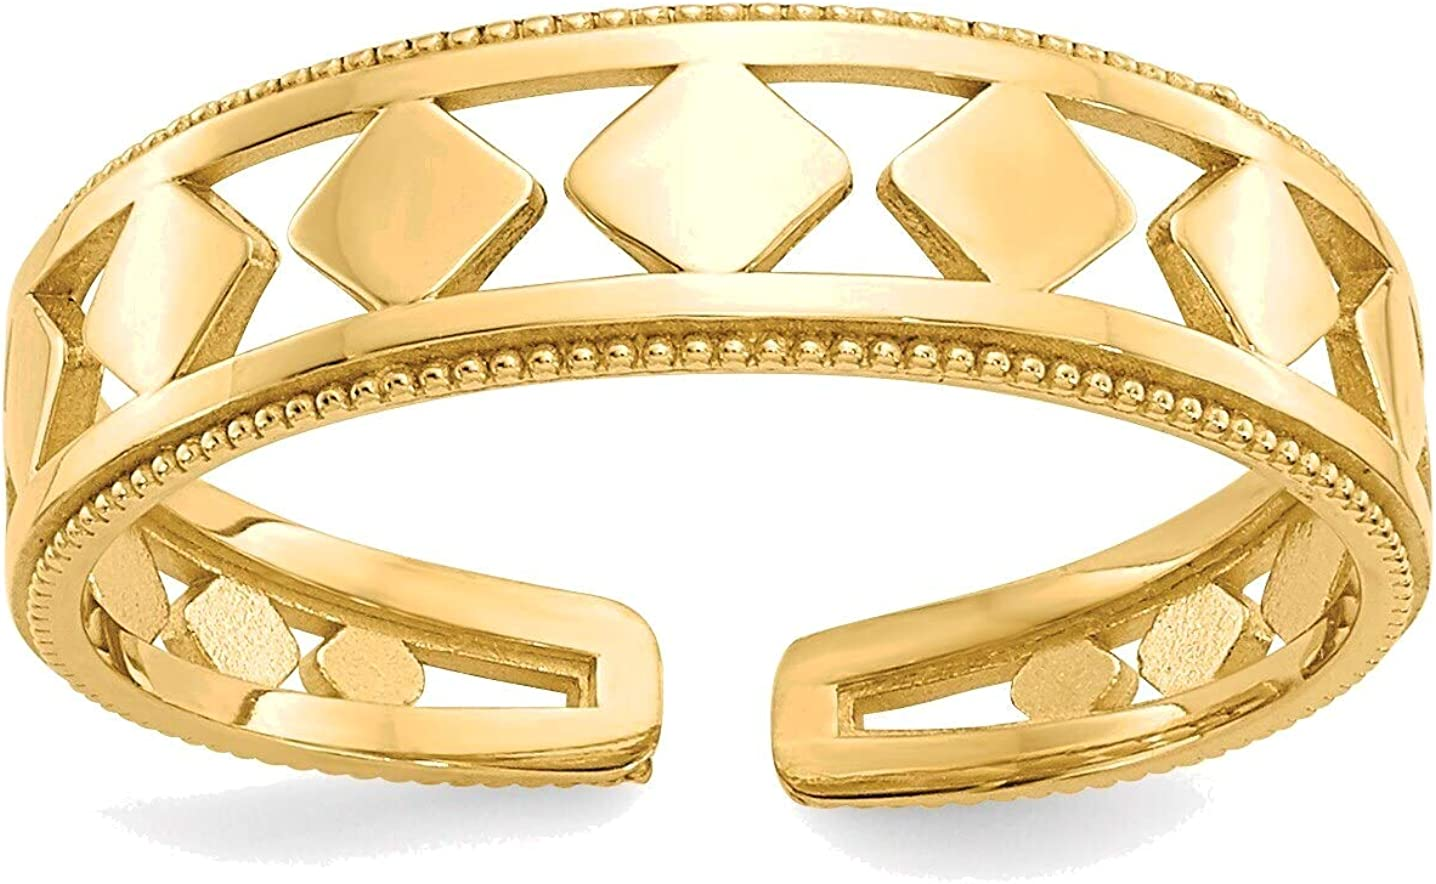 Bonyak Jewelry Diamond Shapes Toe Ring in 14K Yellow Gold in Size 11